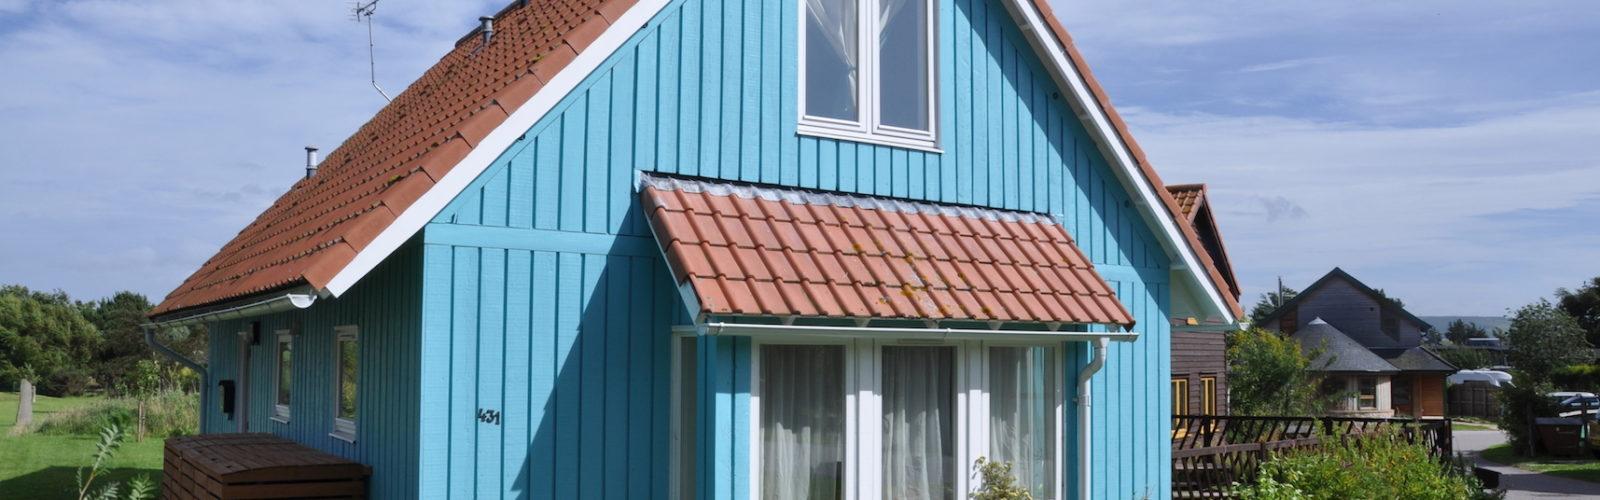 maison bleue findhorn